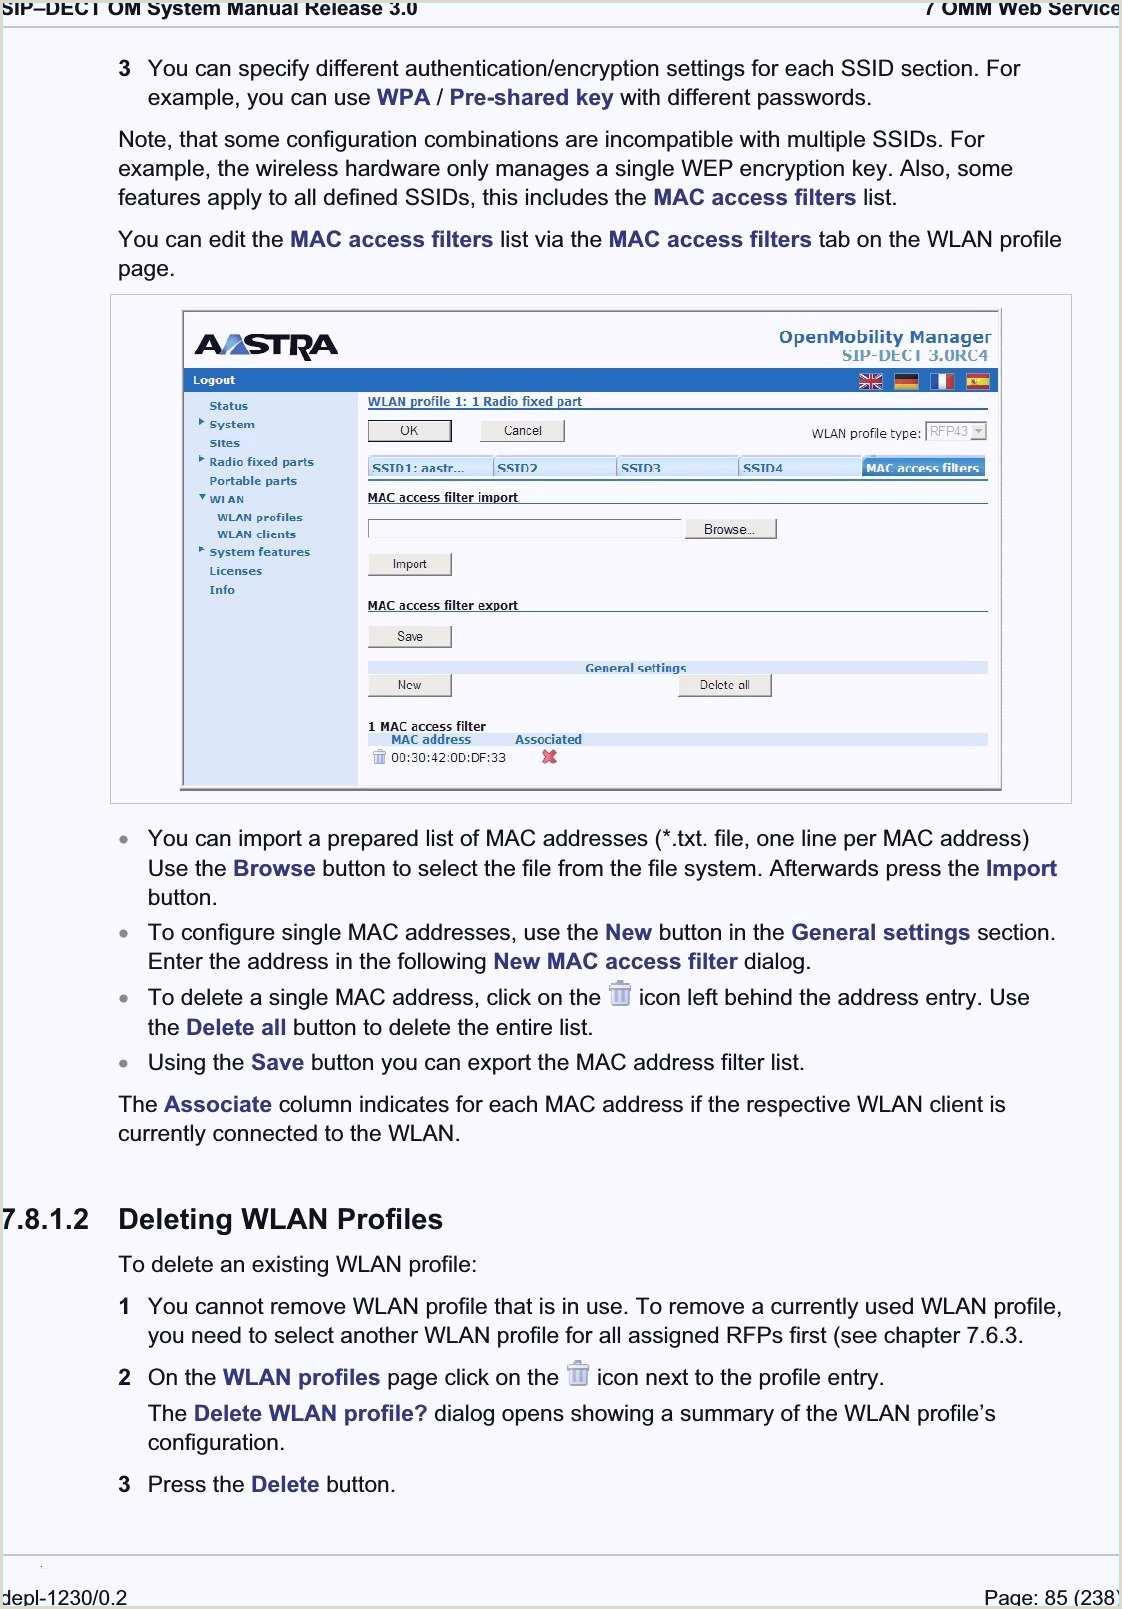 Lebenslauf Muster Word Dokument Vorlagen Cv Word Word Document Cv Templates Word